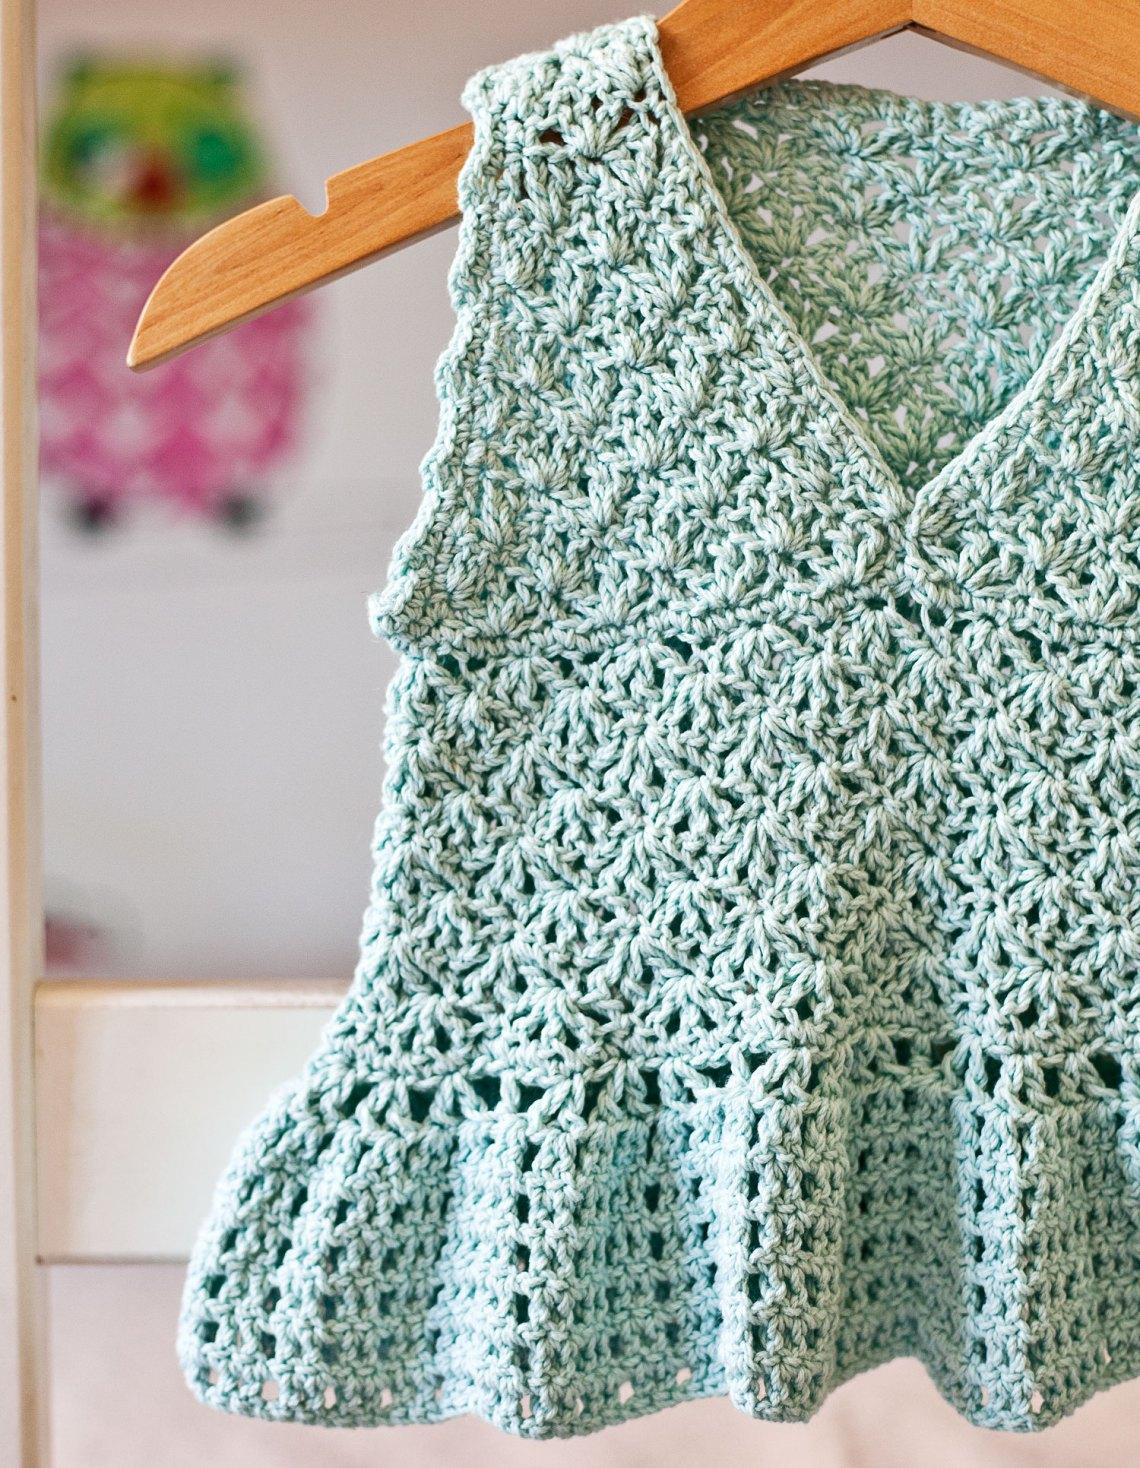 Peplum Top - crochet pattern by Mon Petit Violon